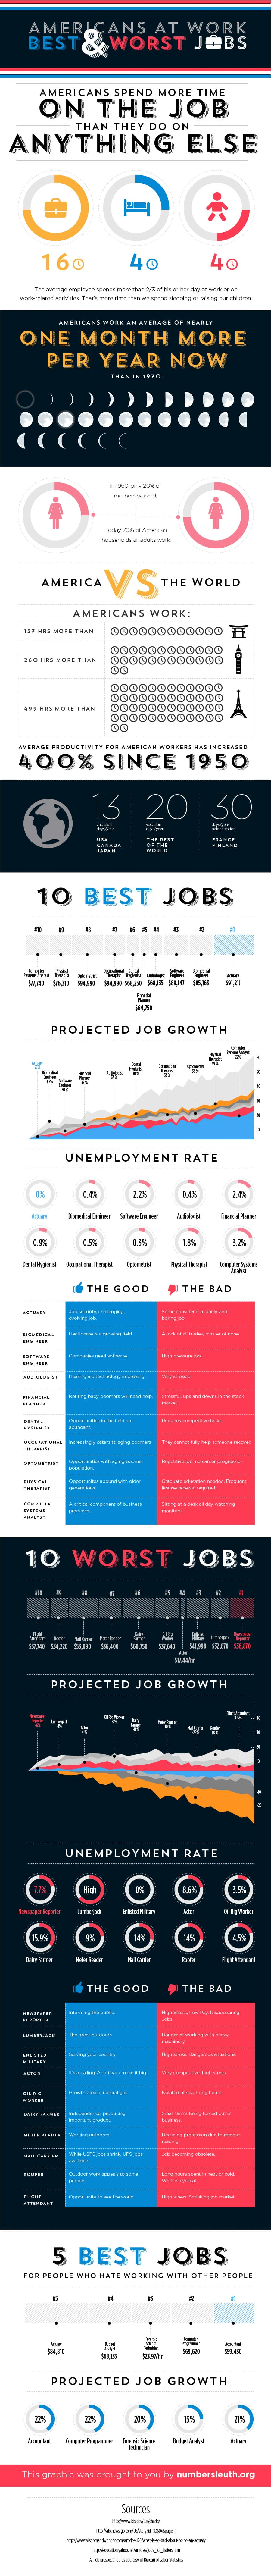 best-worst-jobs-america